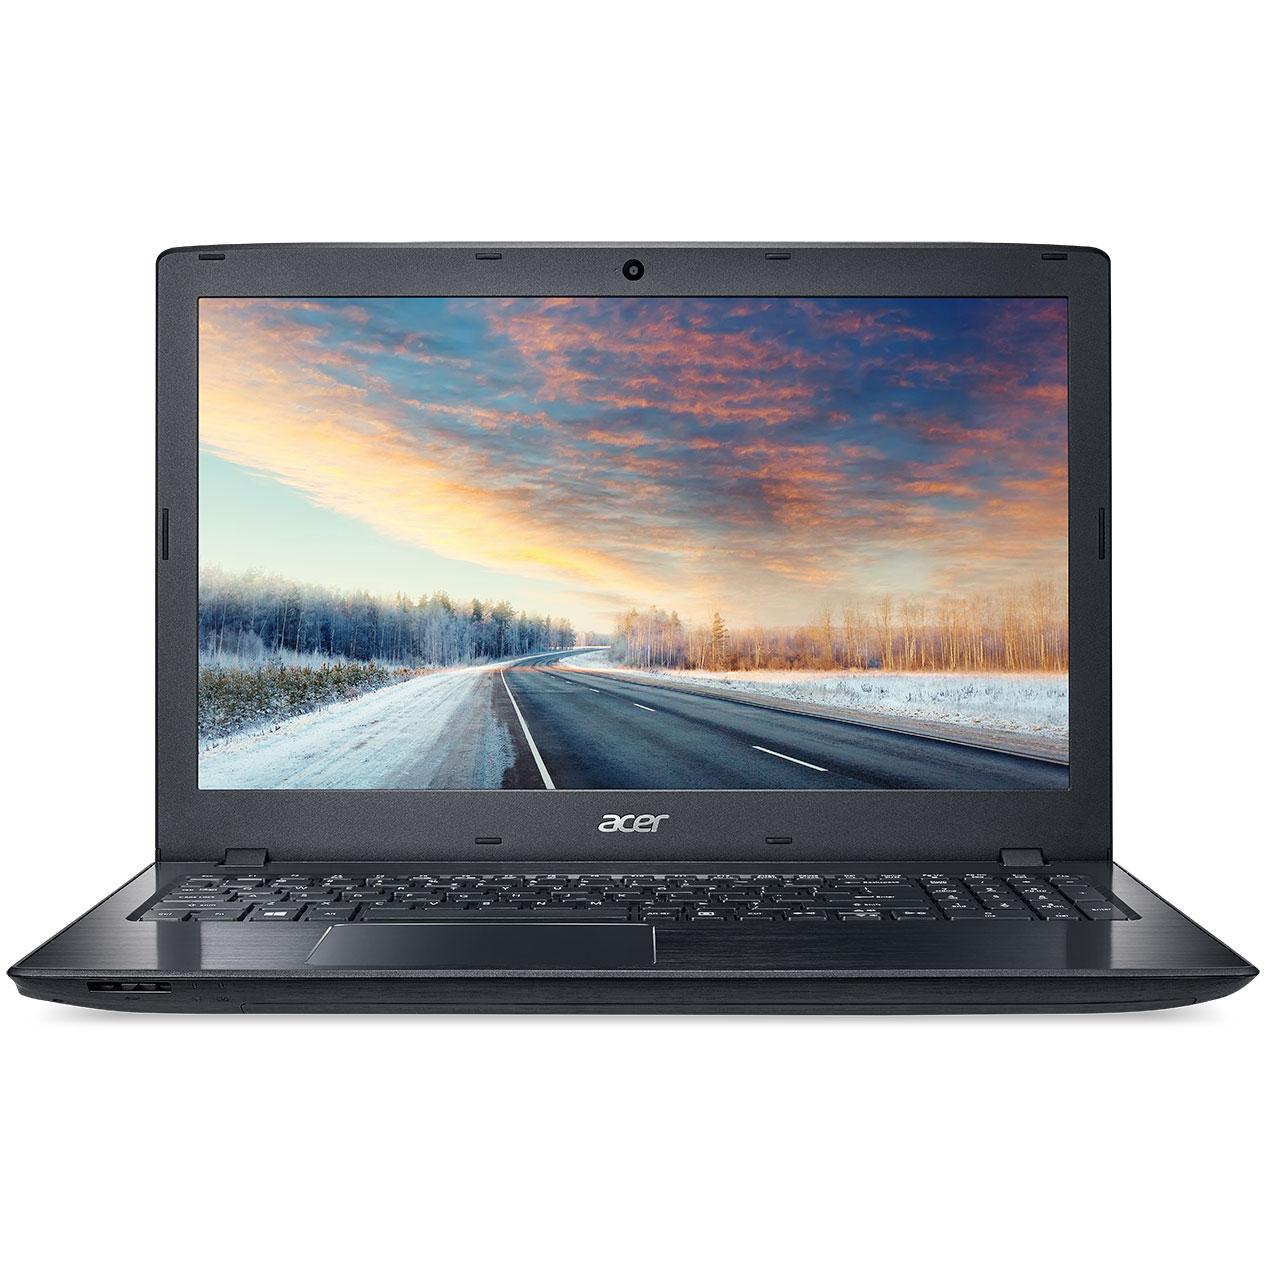 Acer NX.VDMEF.012 - PC portable Acer - Cybertek.fr - 0